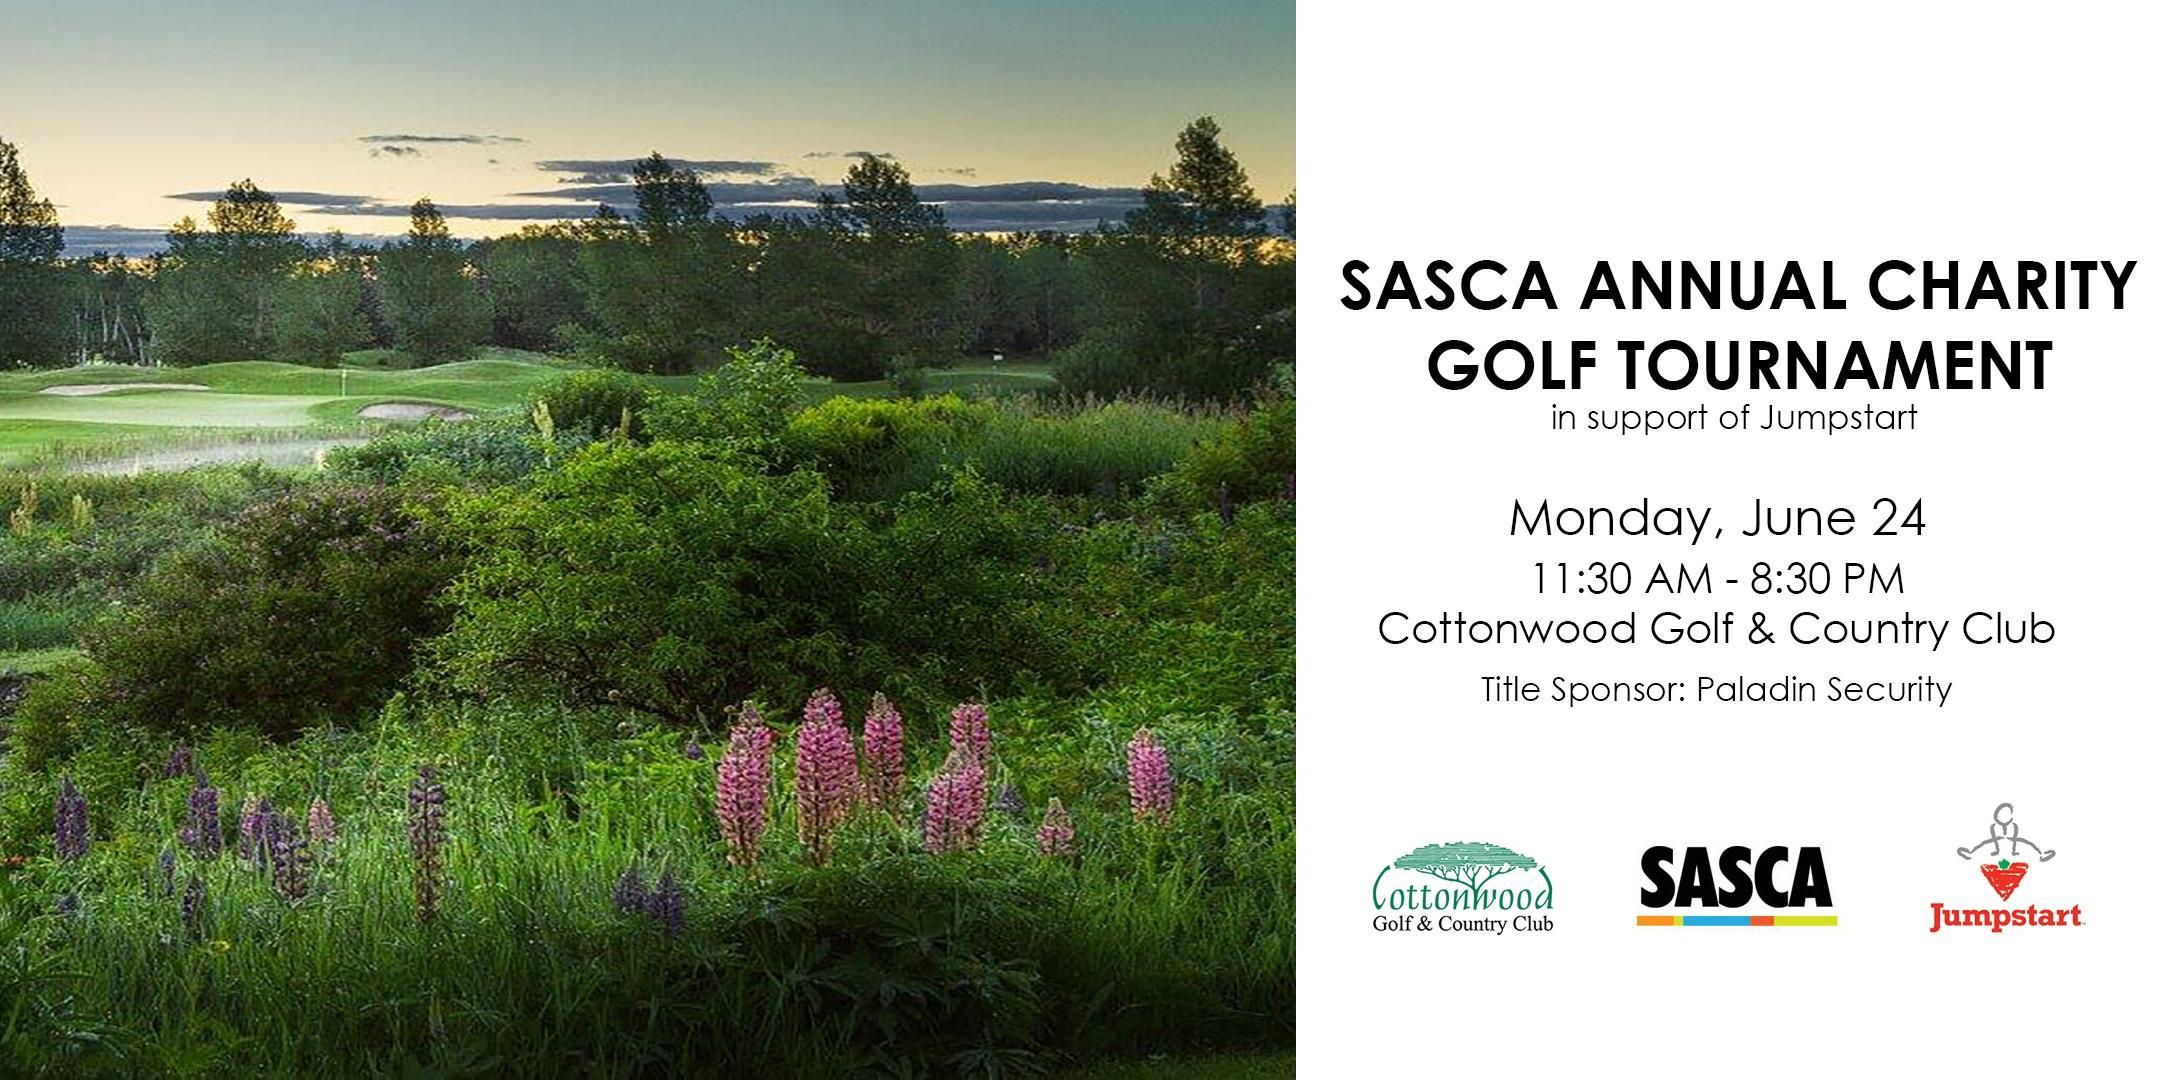 SASCA's Annual Golf Tournament 2019